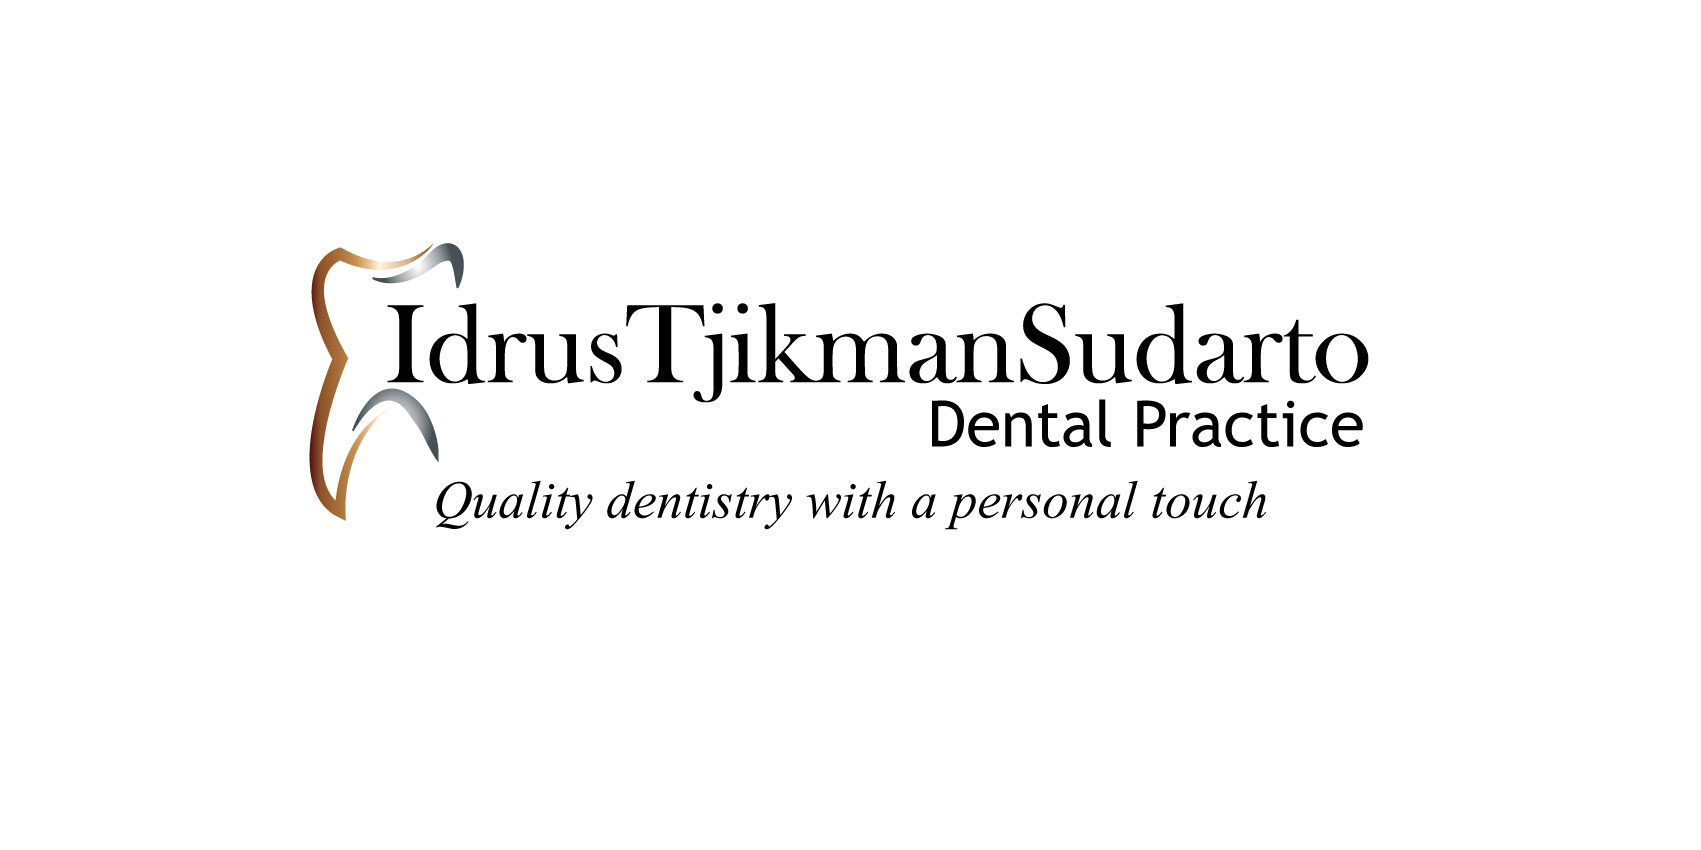 Idrus Tjikman Sudarto Dental Practice